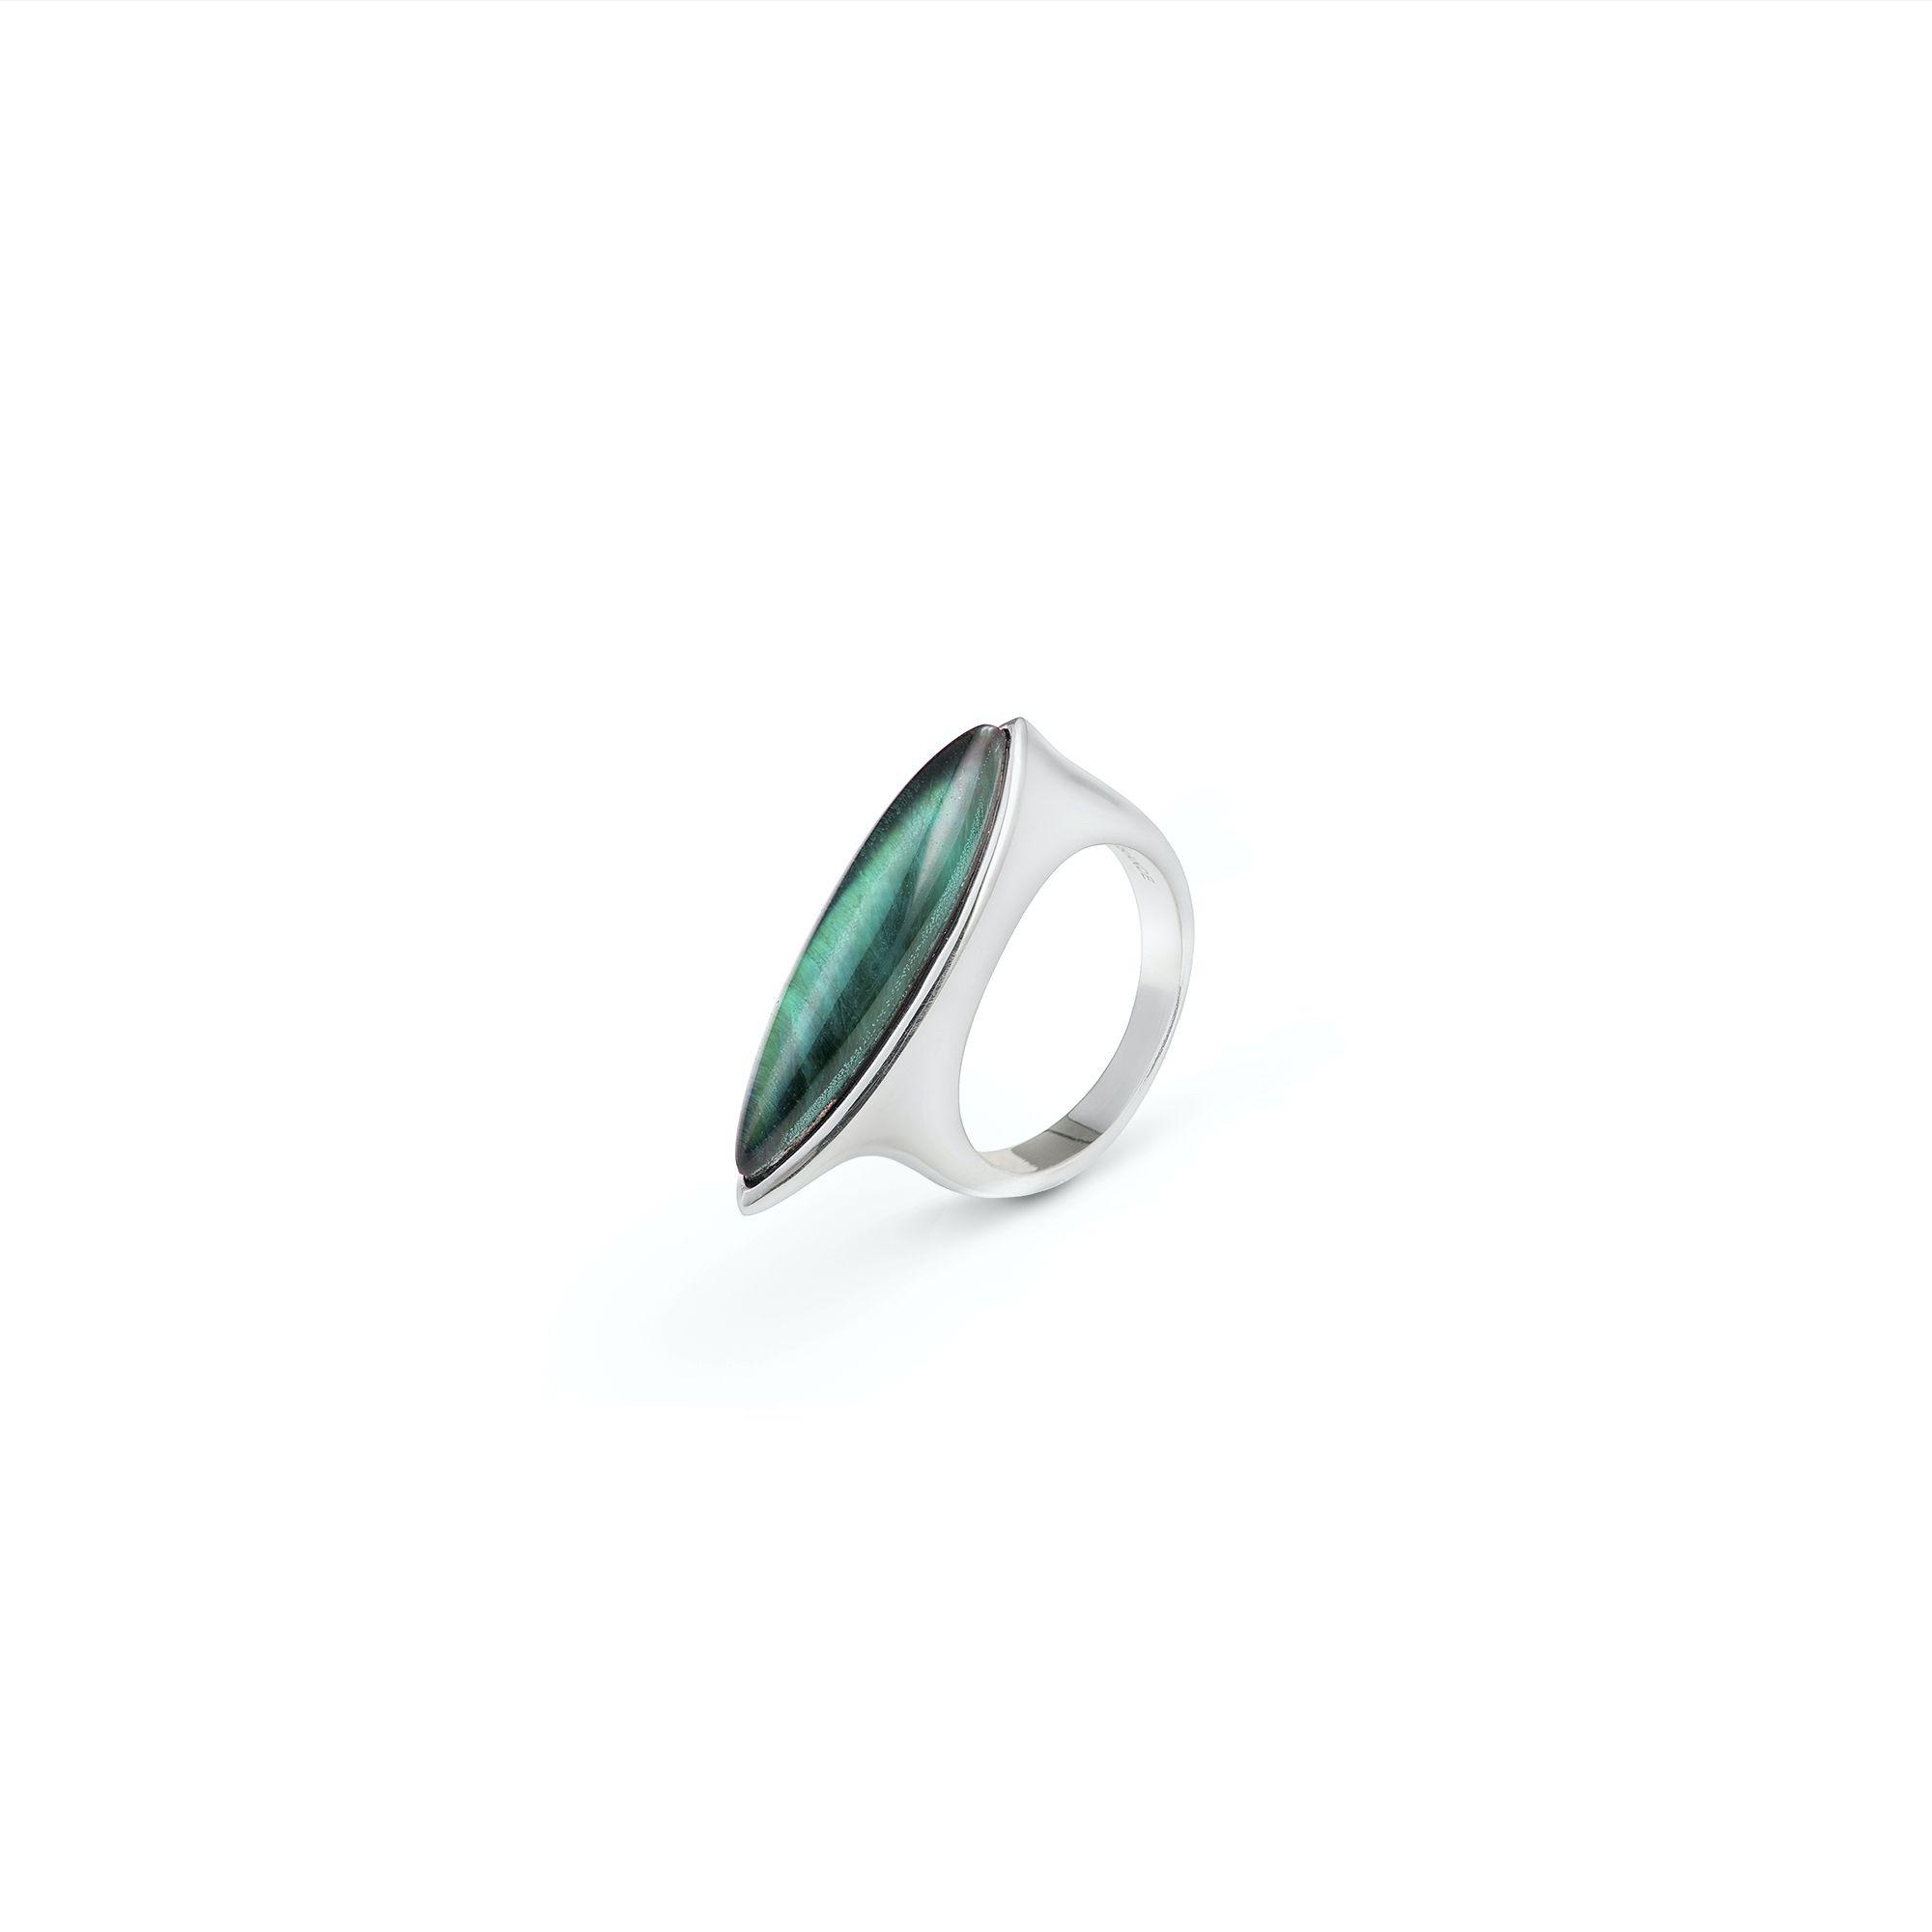 Green Navetta ring Silver ring